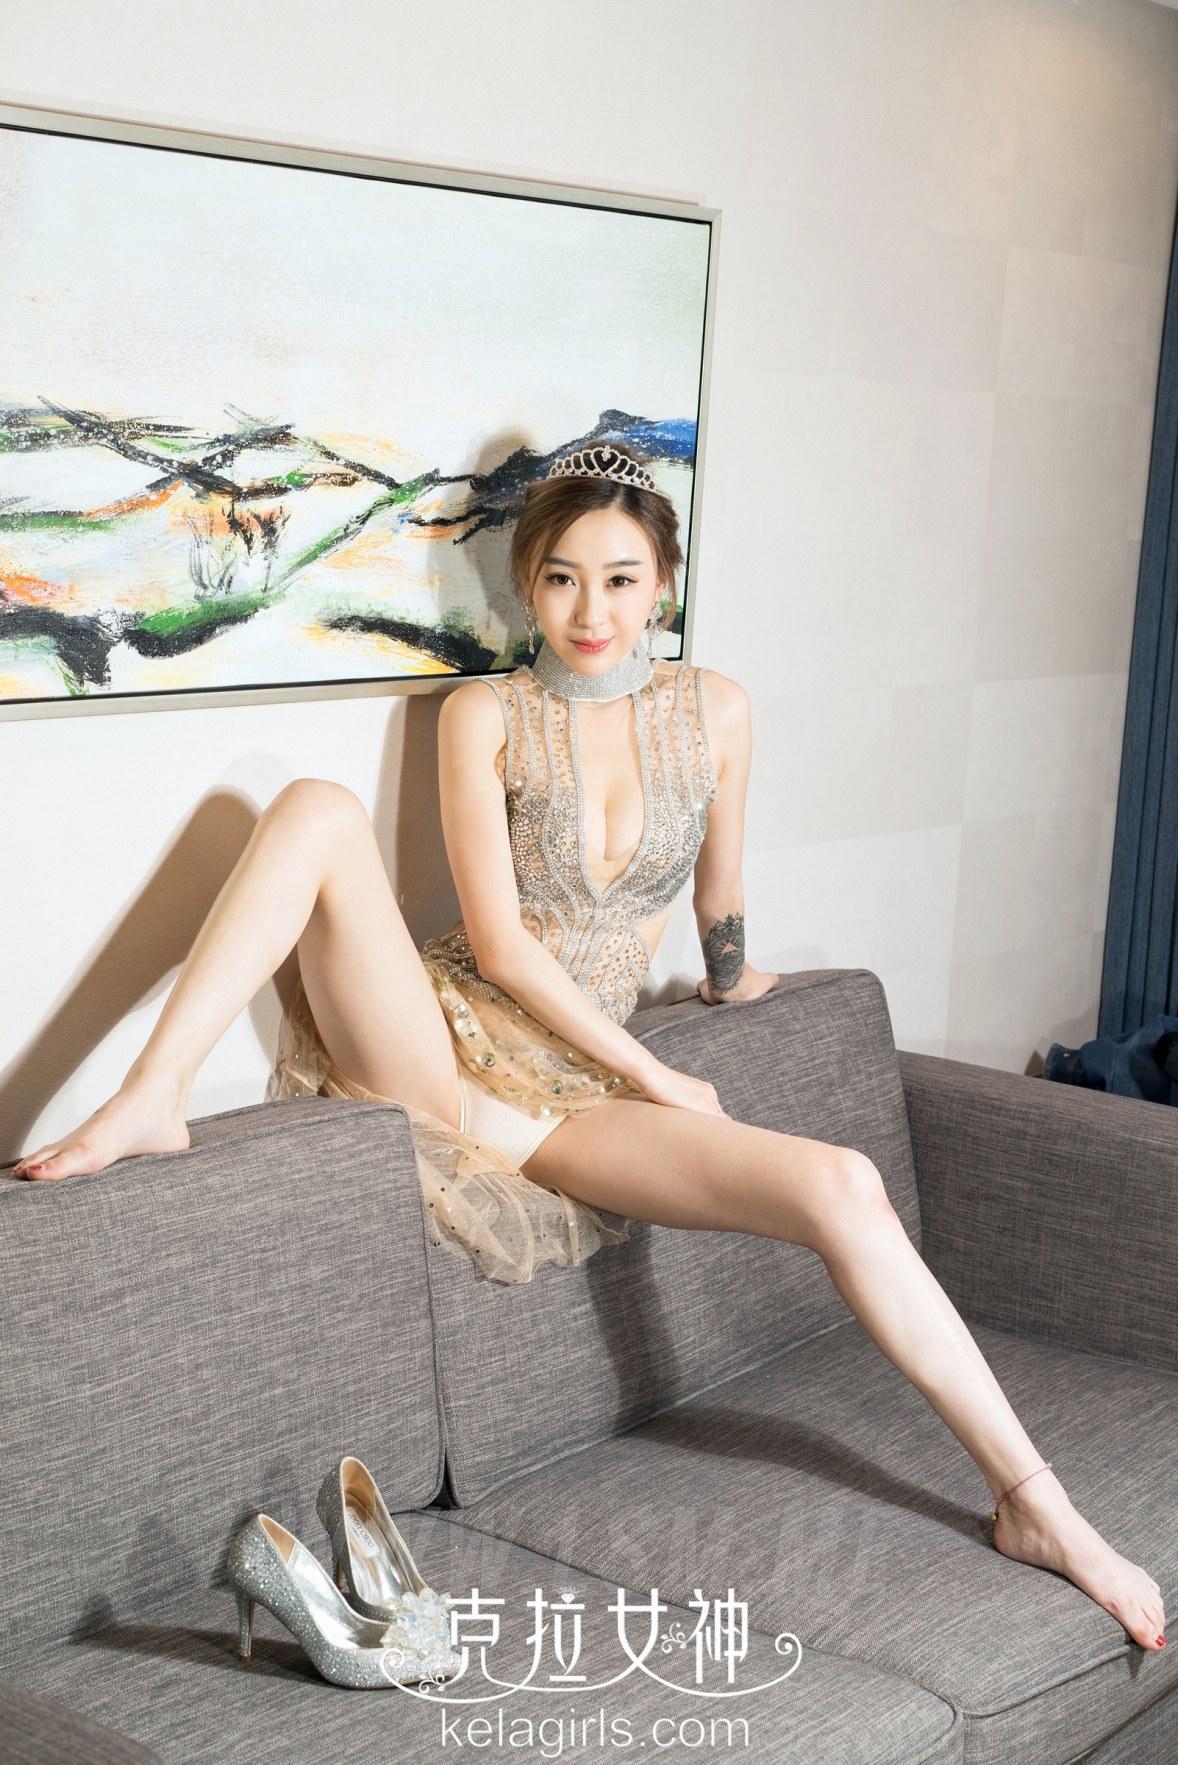 KeLa 克拉女神 No.056 Modo 张茜水晶鞋里的玉足 - 3